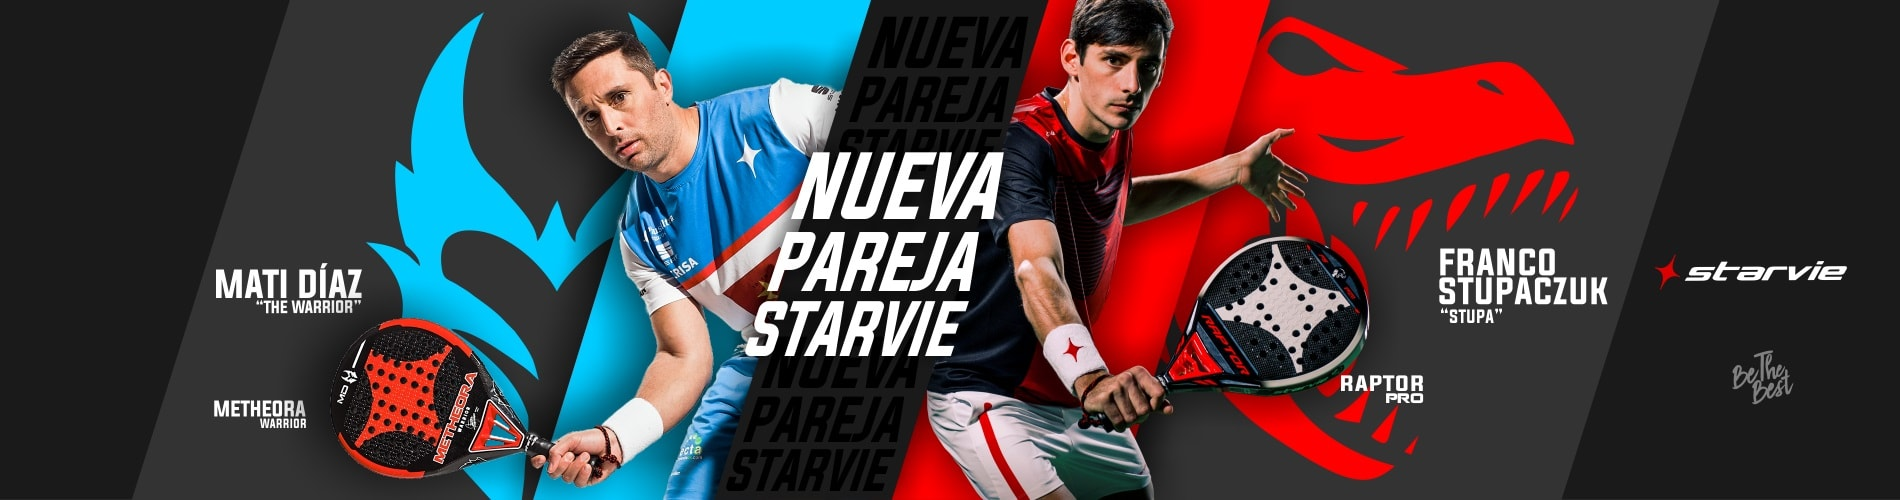 Nueva pareja StarVie - Matias Diaz - Franco Stupaczuk